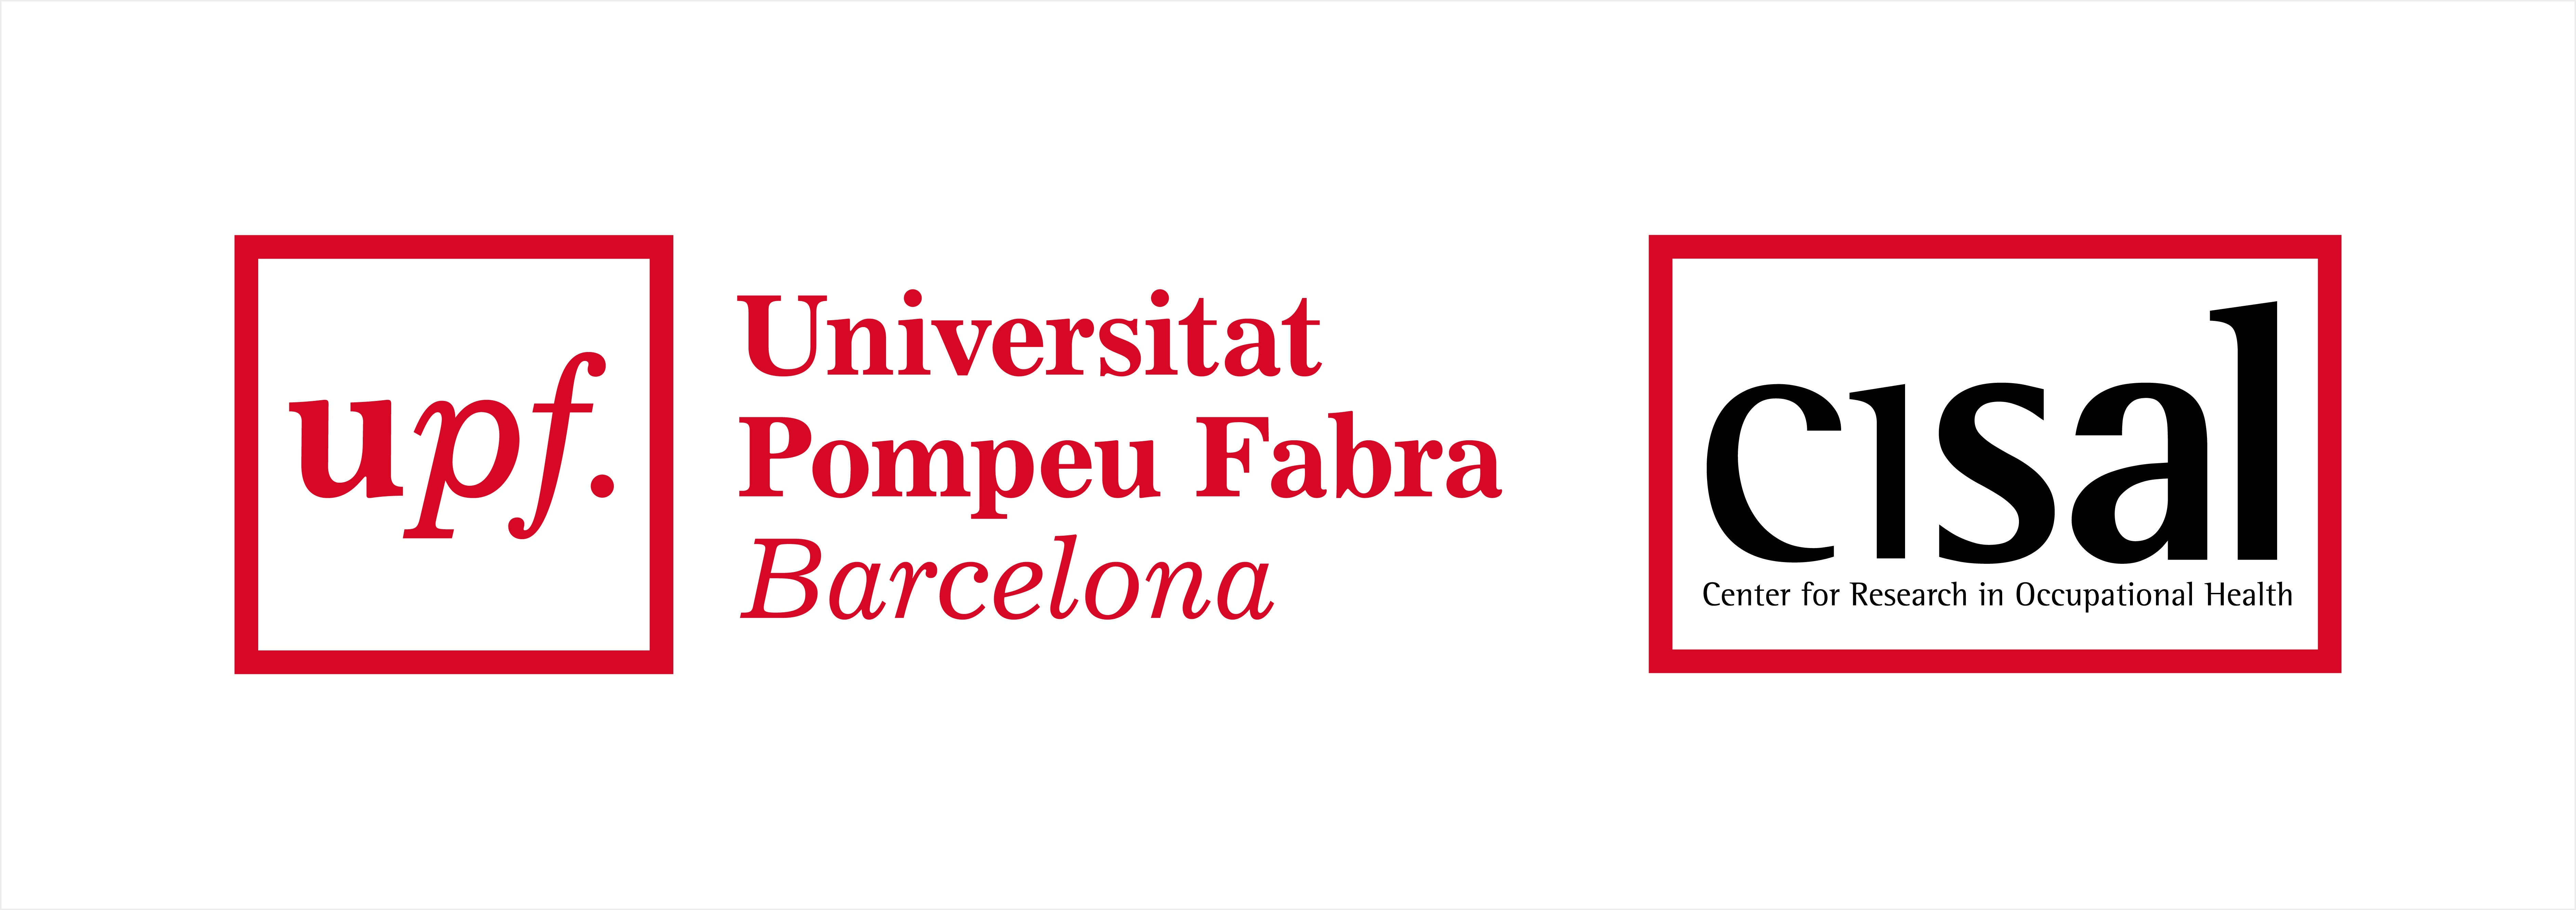 CISAL - Universitat Pompeu Fabra